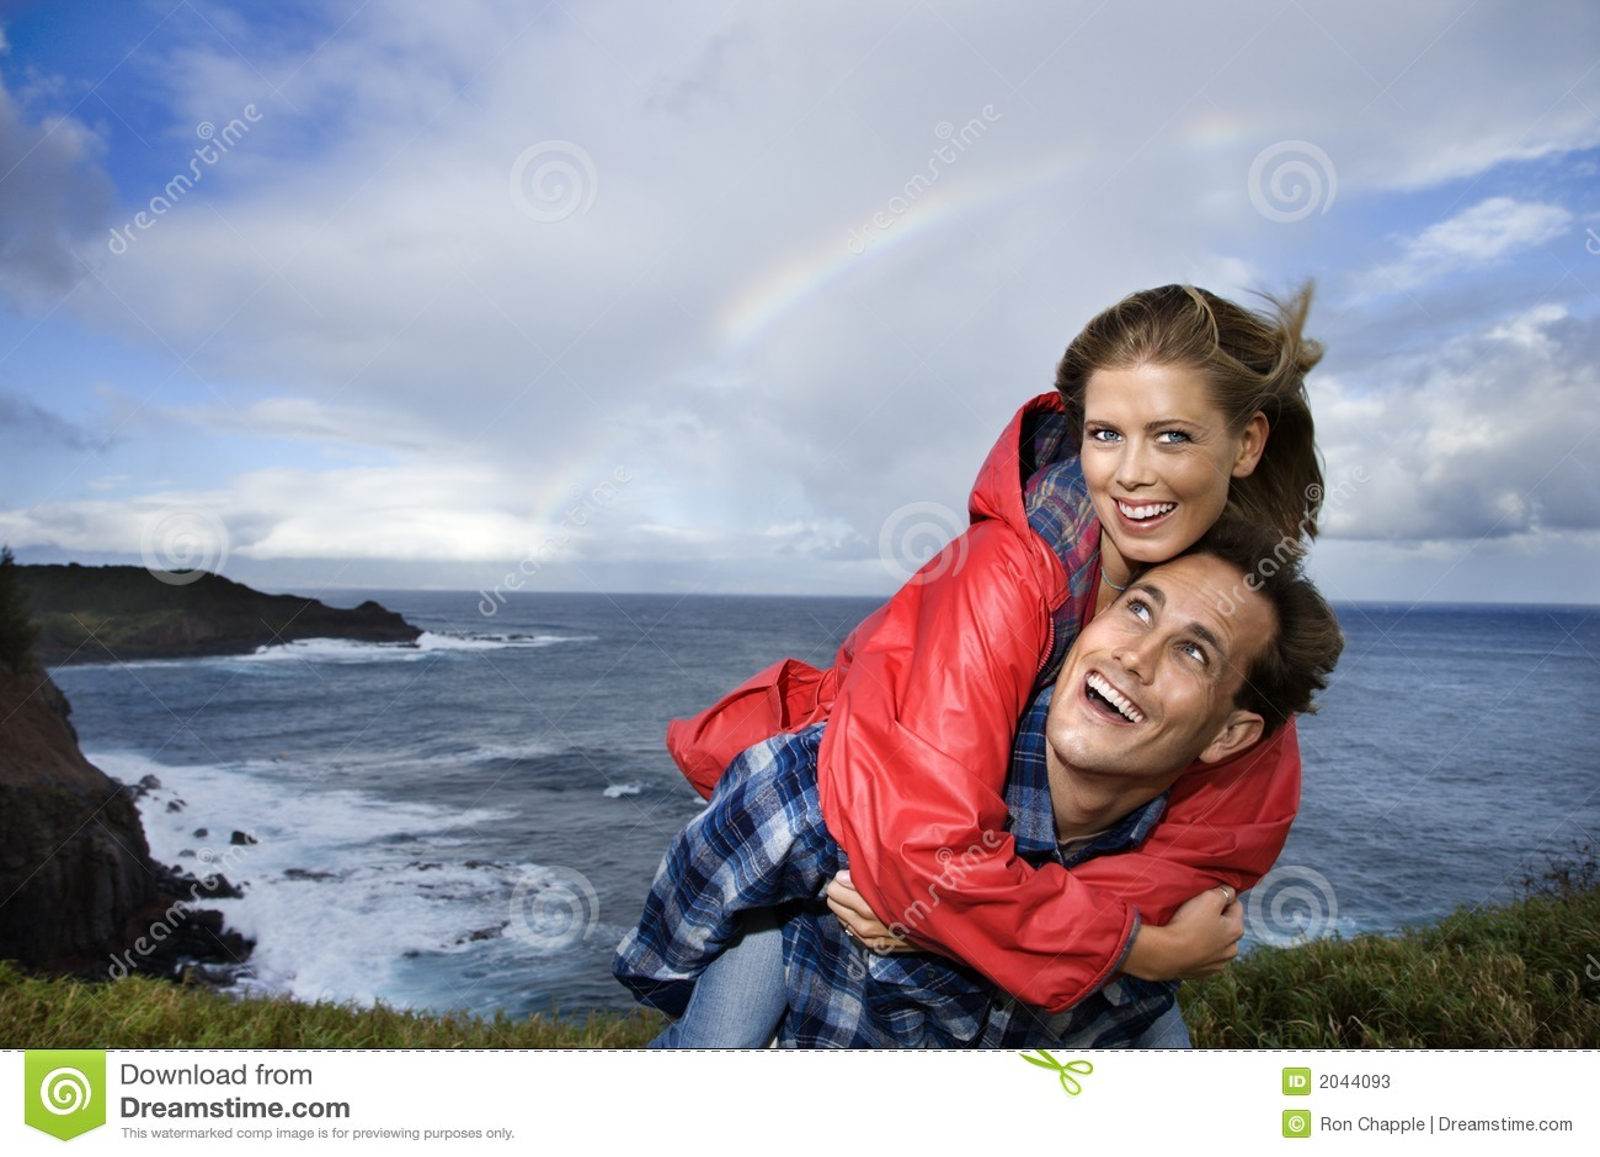 Couple vacationing in Maui, Hawaii.